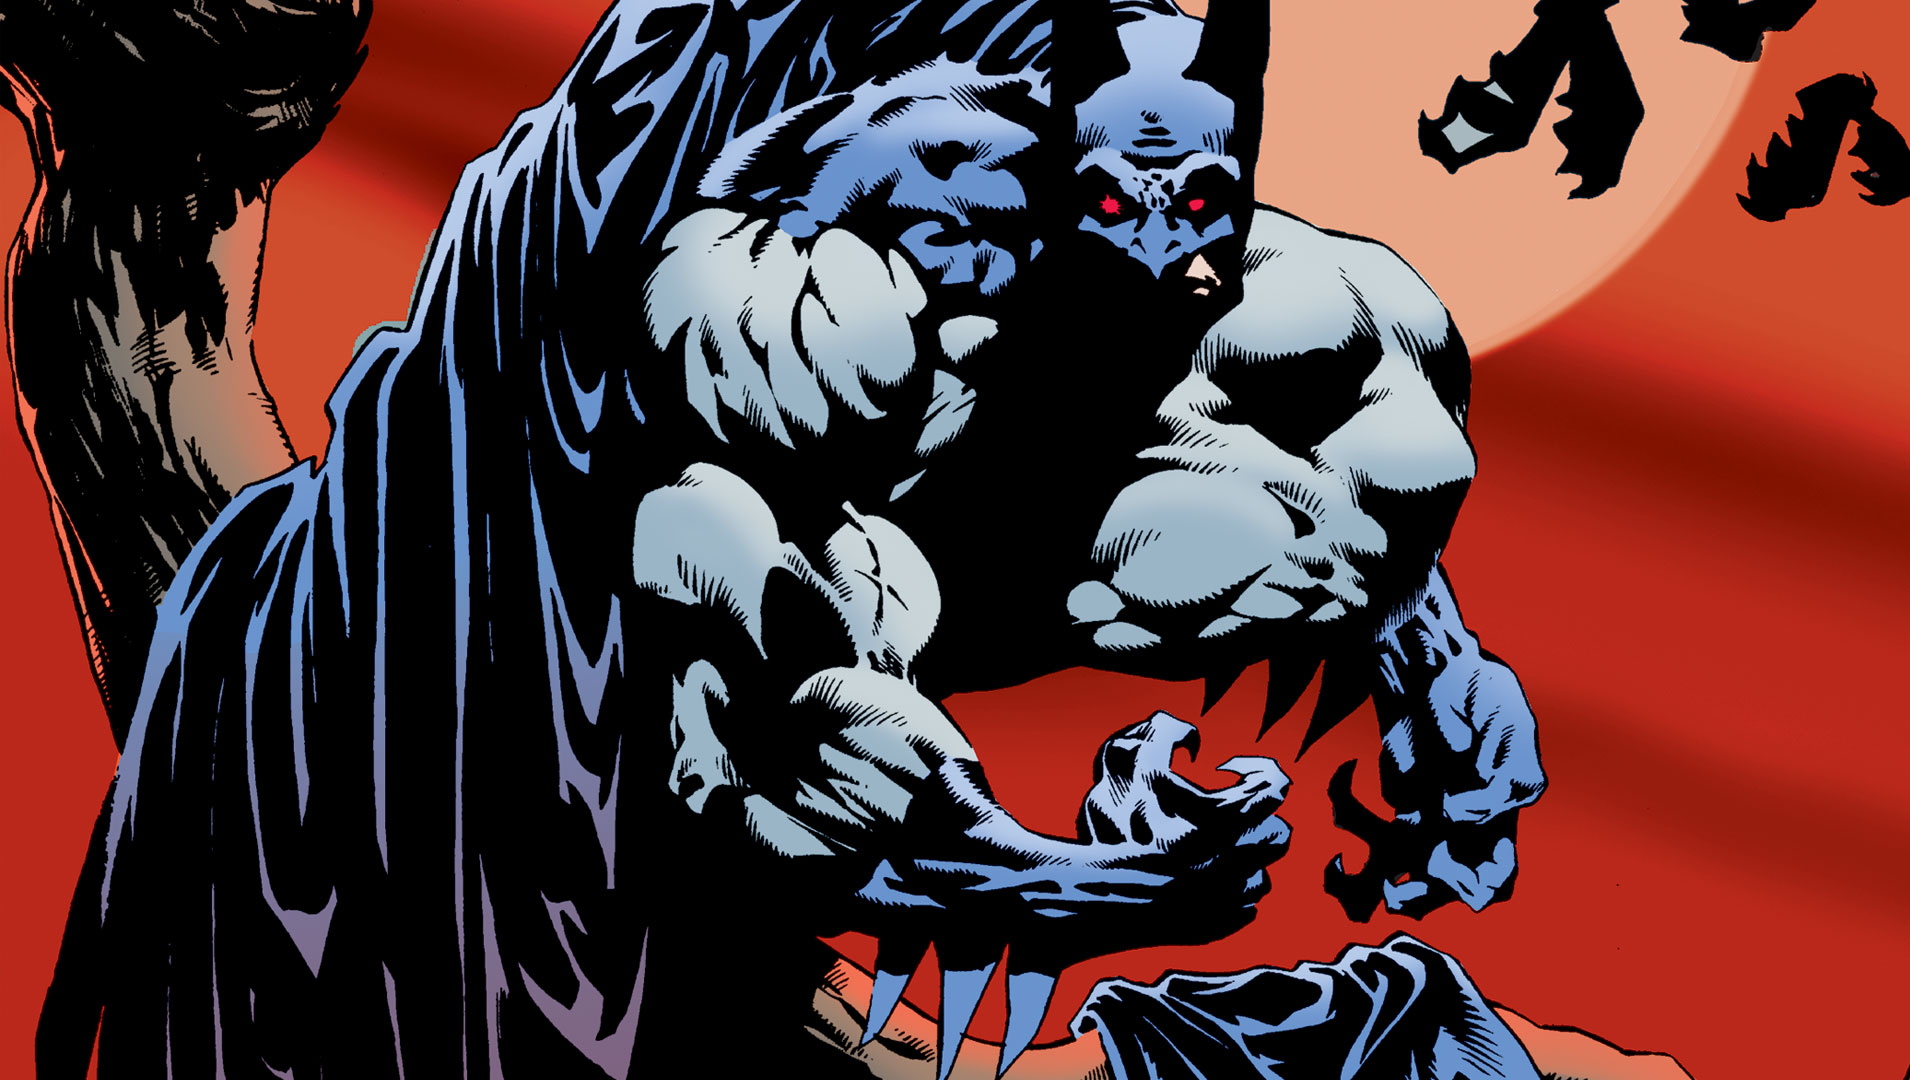 Elseworlds: spiegata l'assenza di Batman nel crossover thumbnail